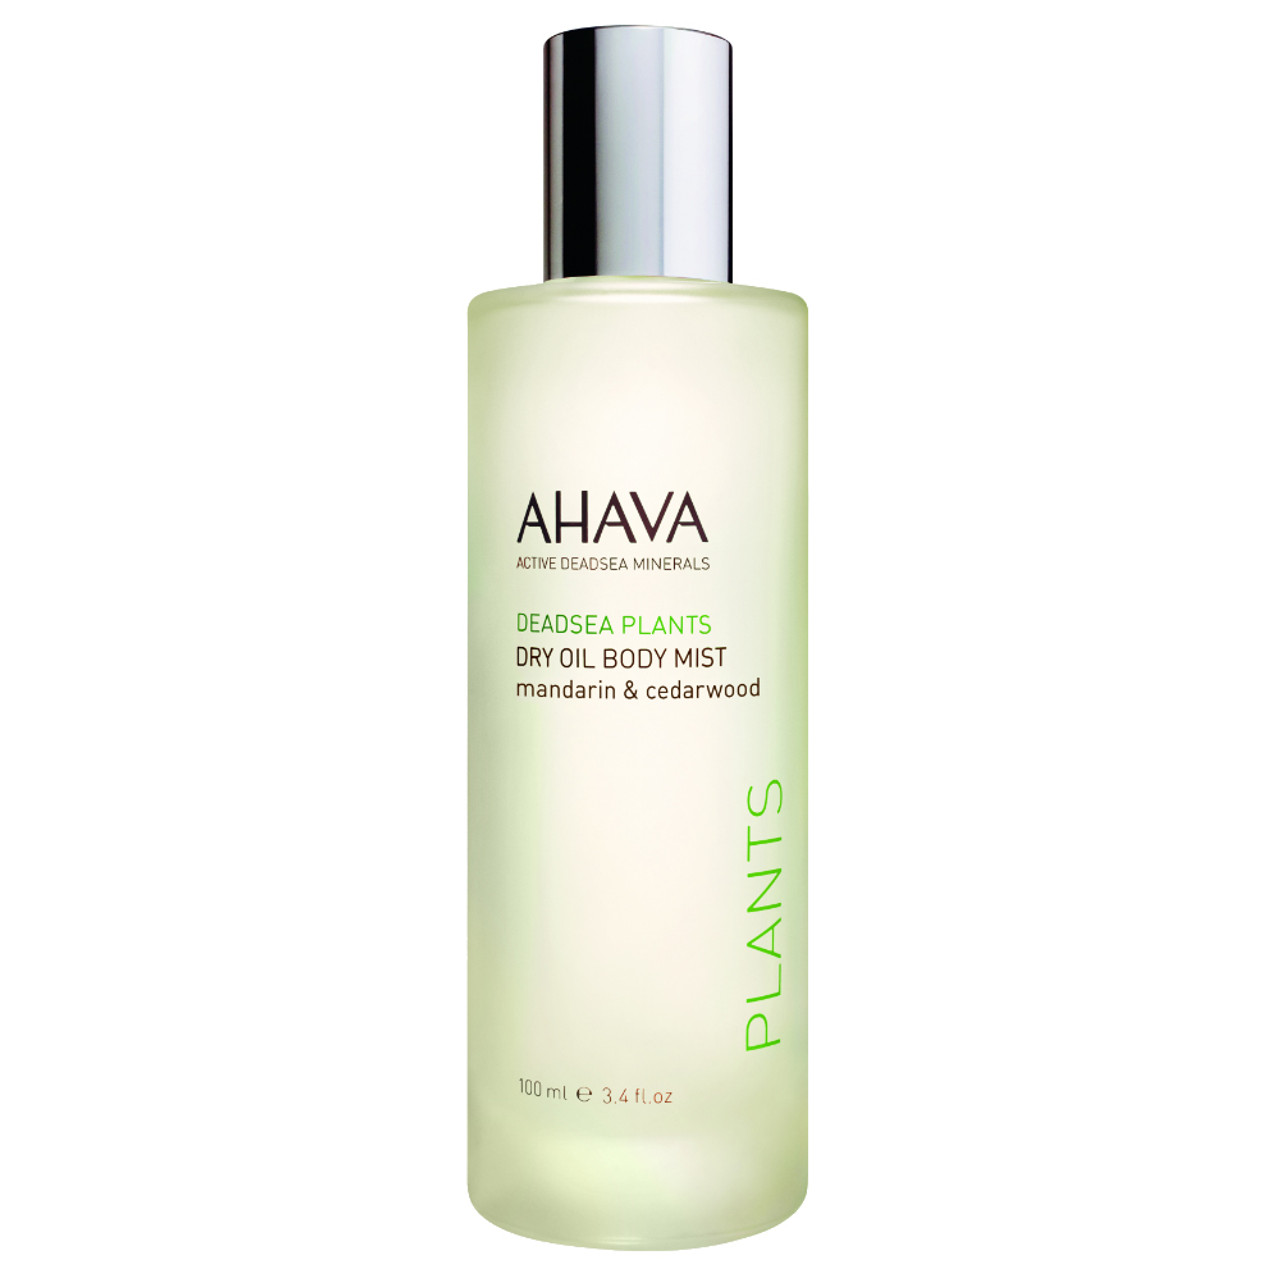 AHAVA Dry Oil Body Mist Mandarin Cedarwood BeautifiedYou.com